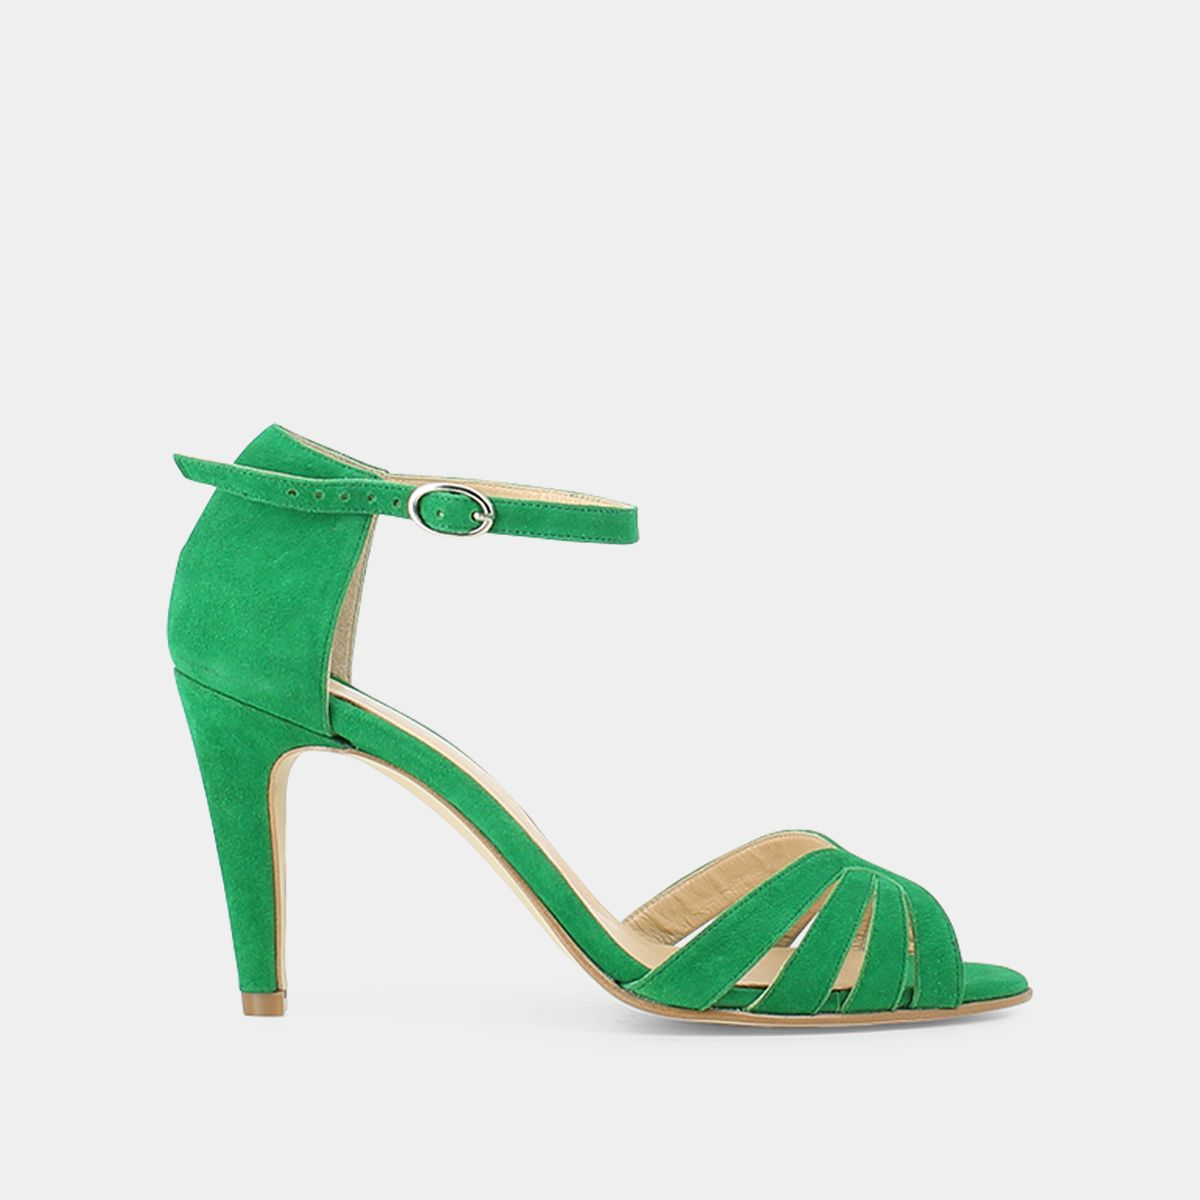 Sandales à lanières en velours vert Jonak marine